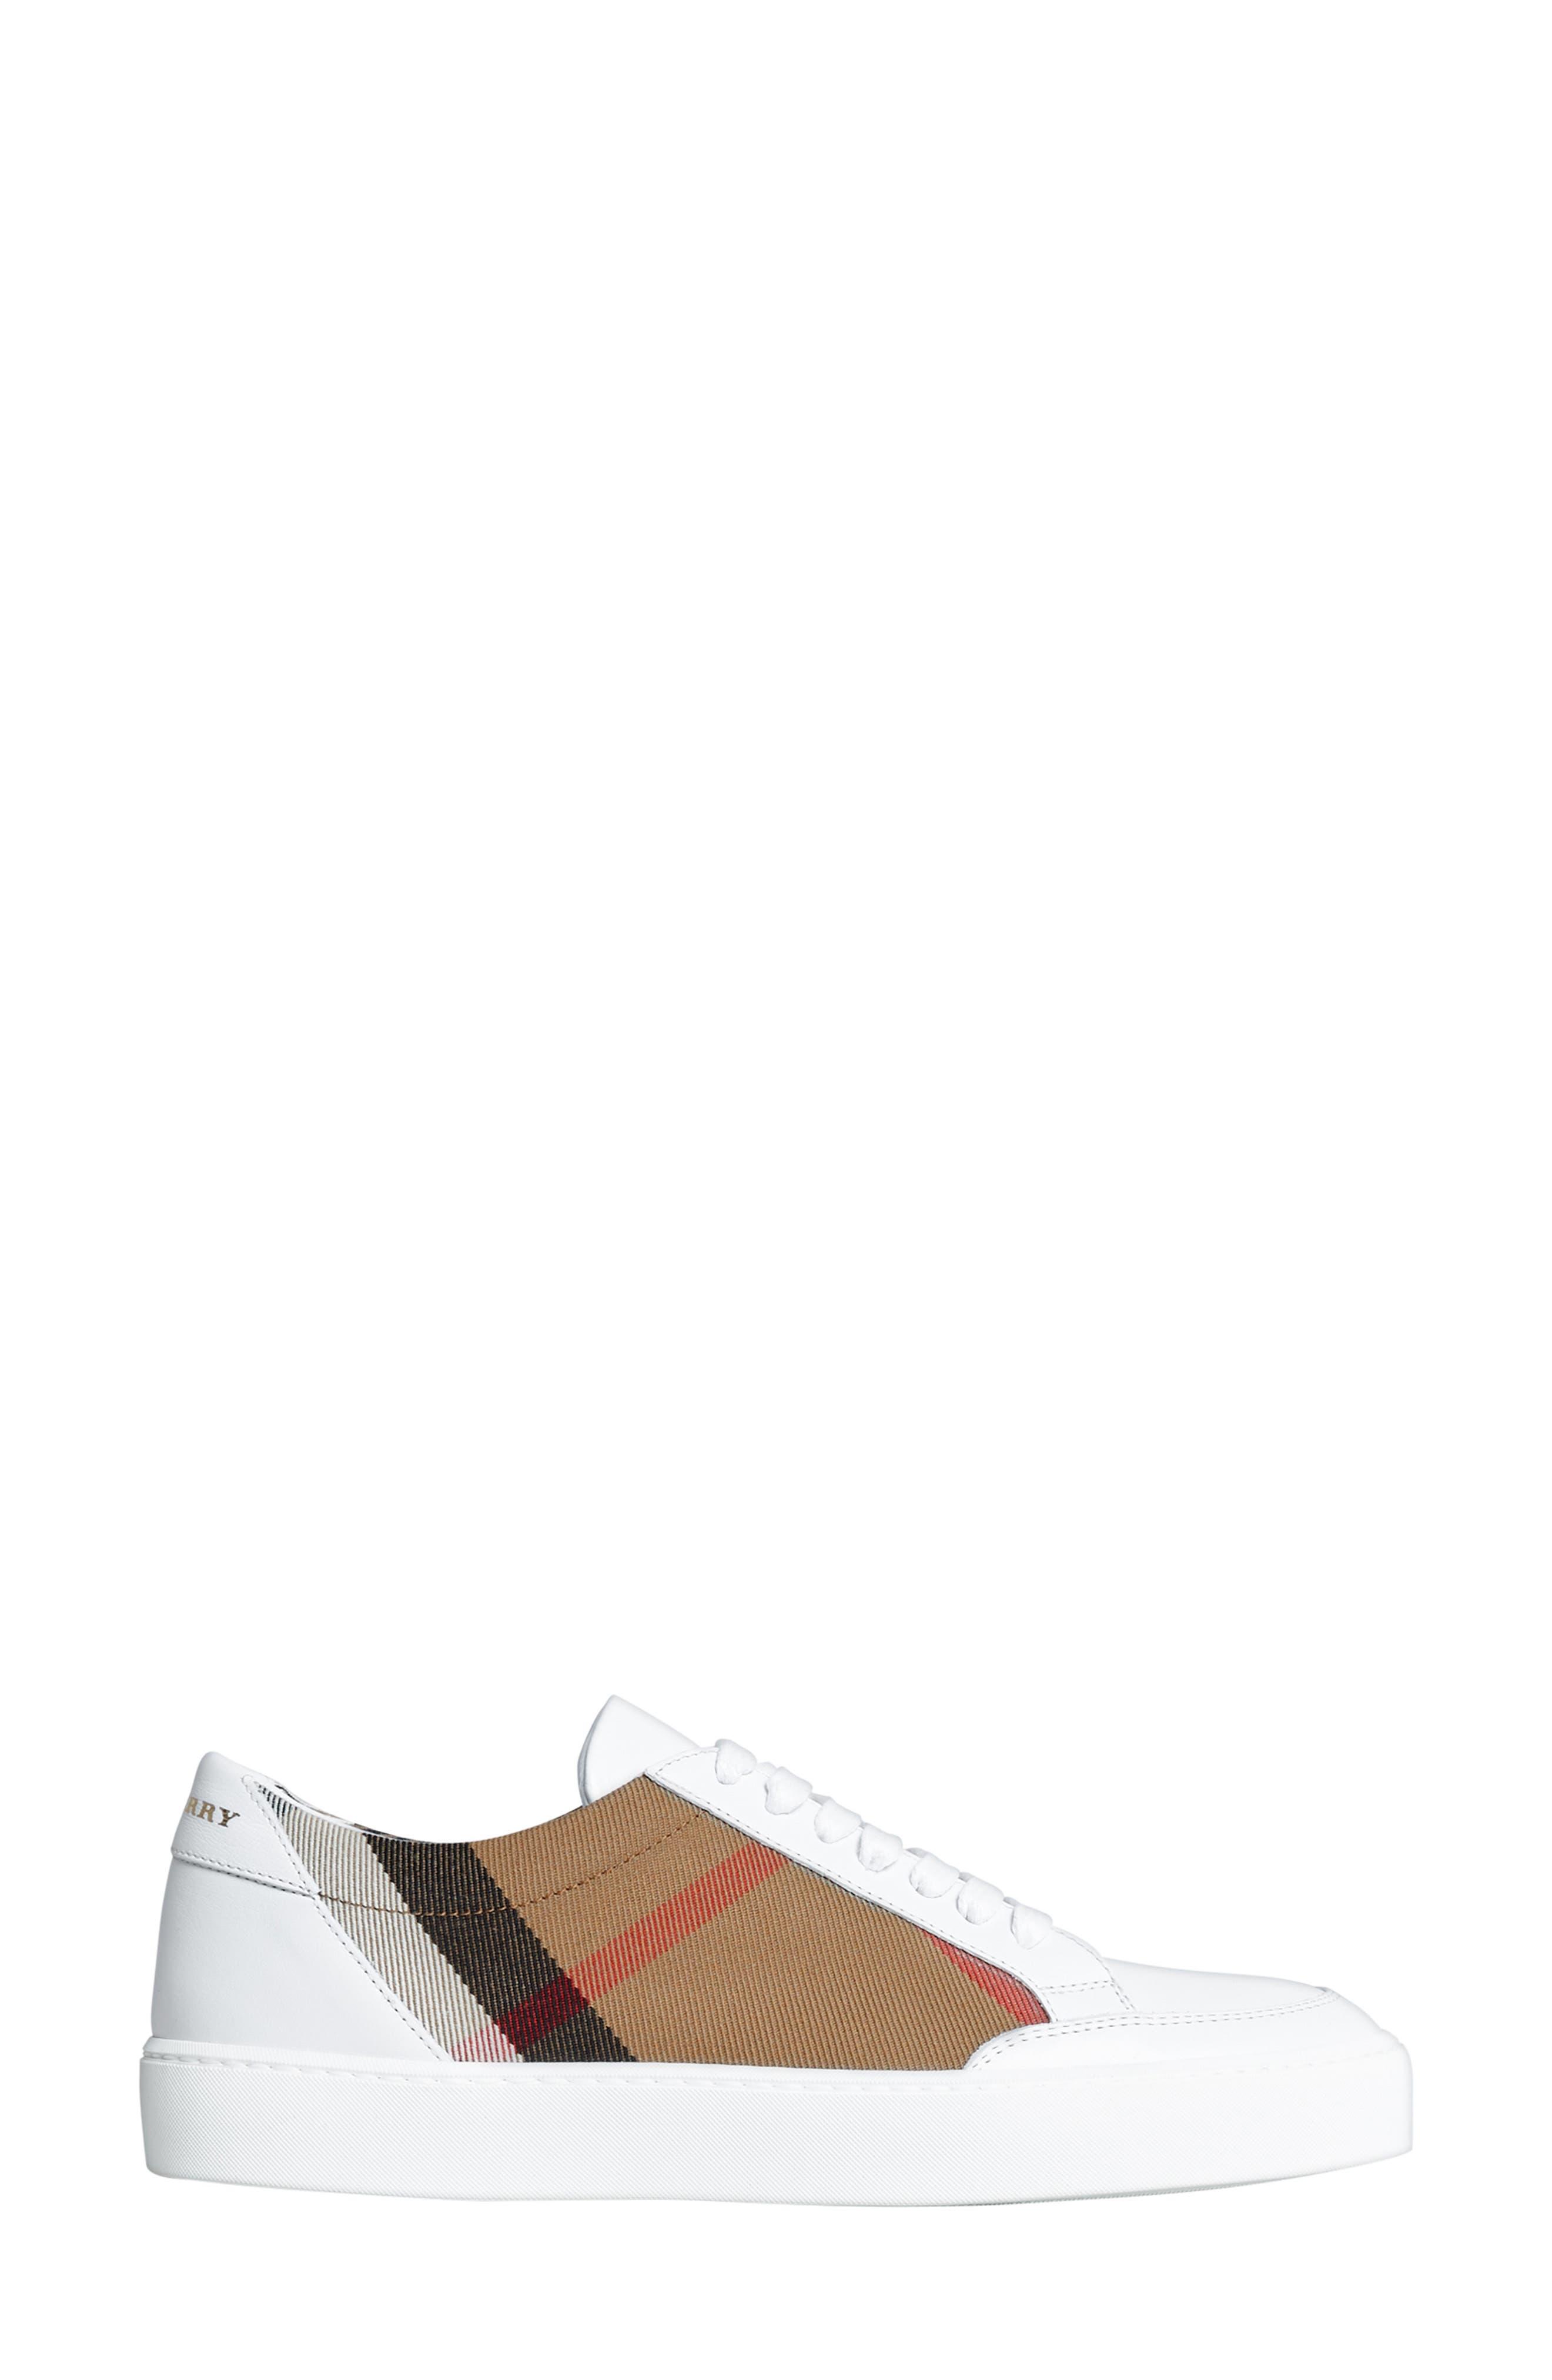 BURBERRY, Salmond Sneaker, Alternate thumbnail 3, color, WHITE